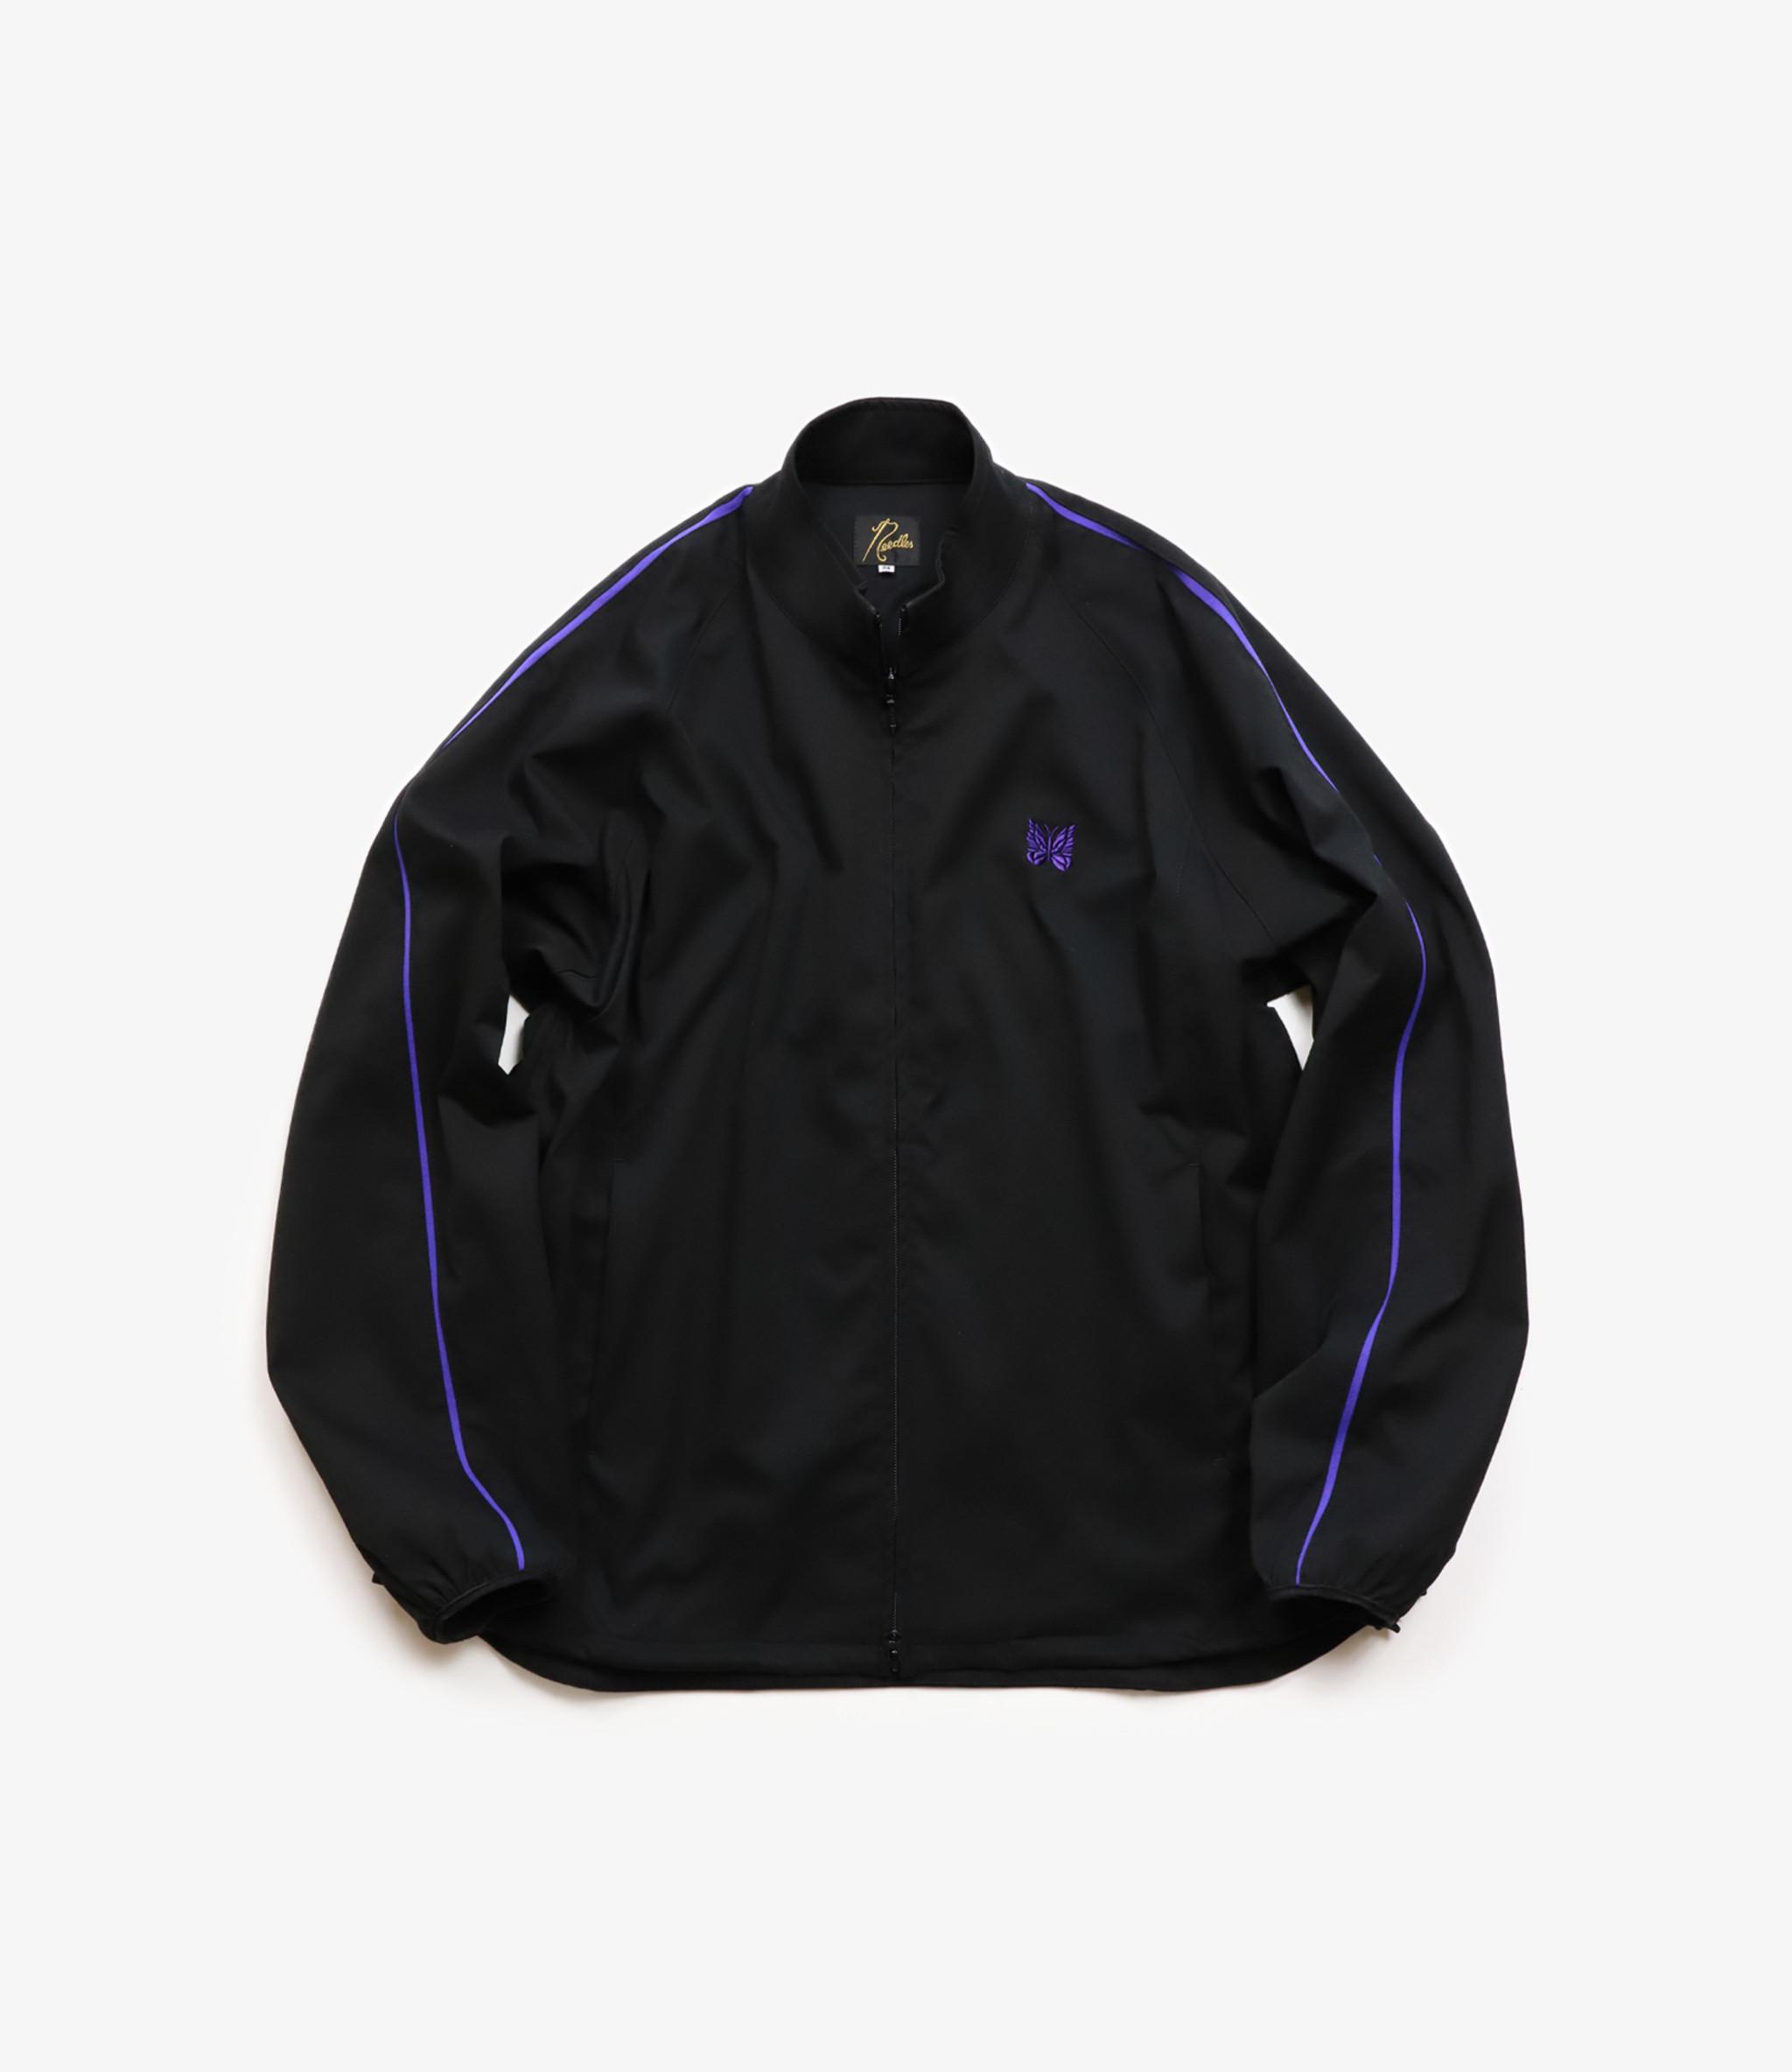 Needles Run-Up Jacket - Poly Dry Twill - Black